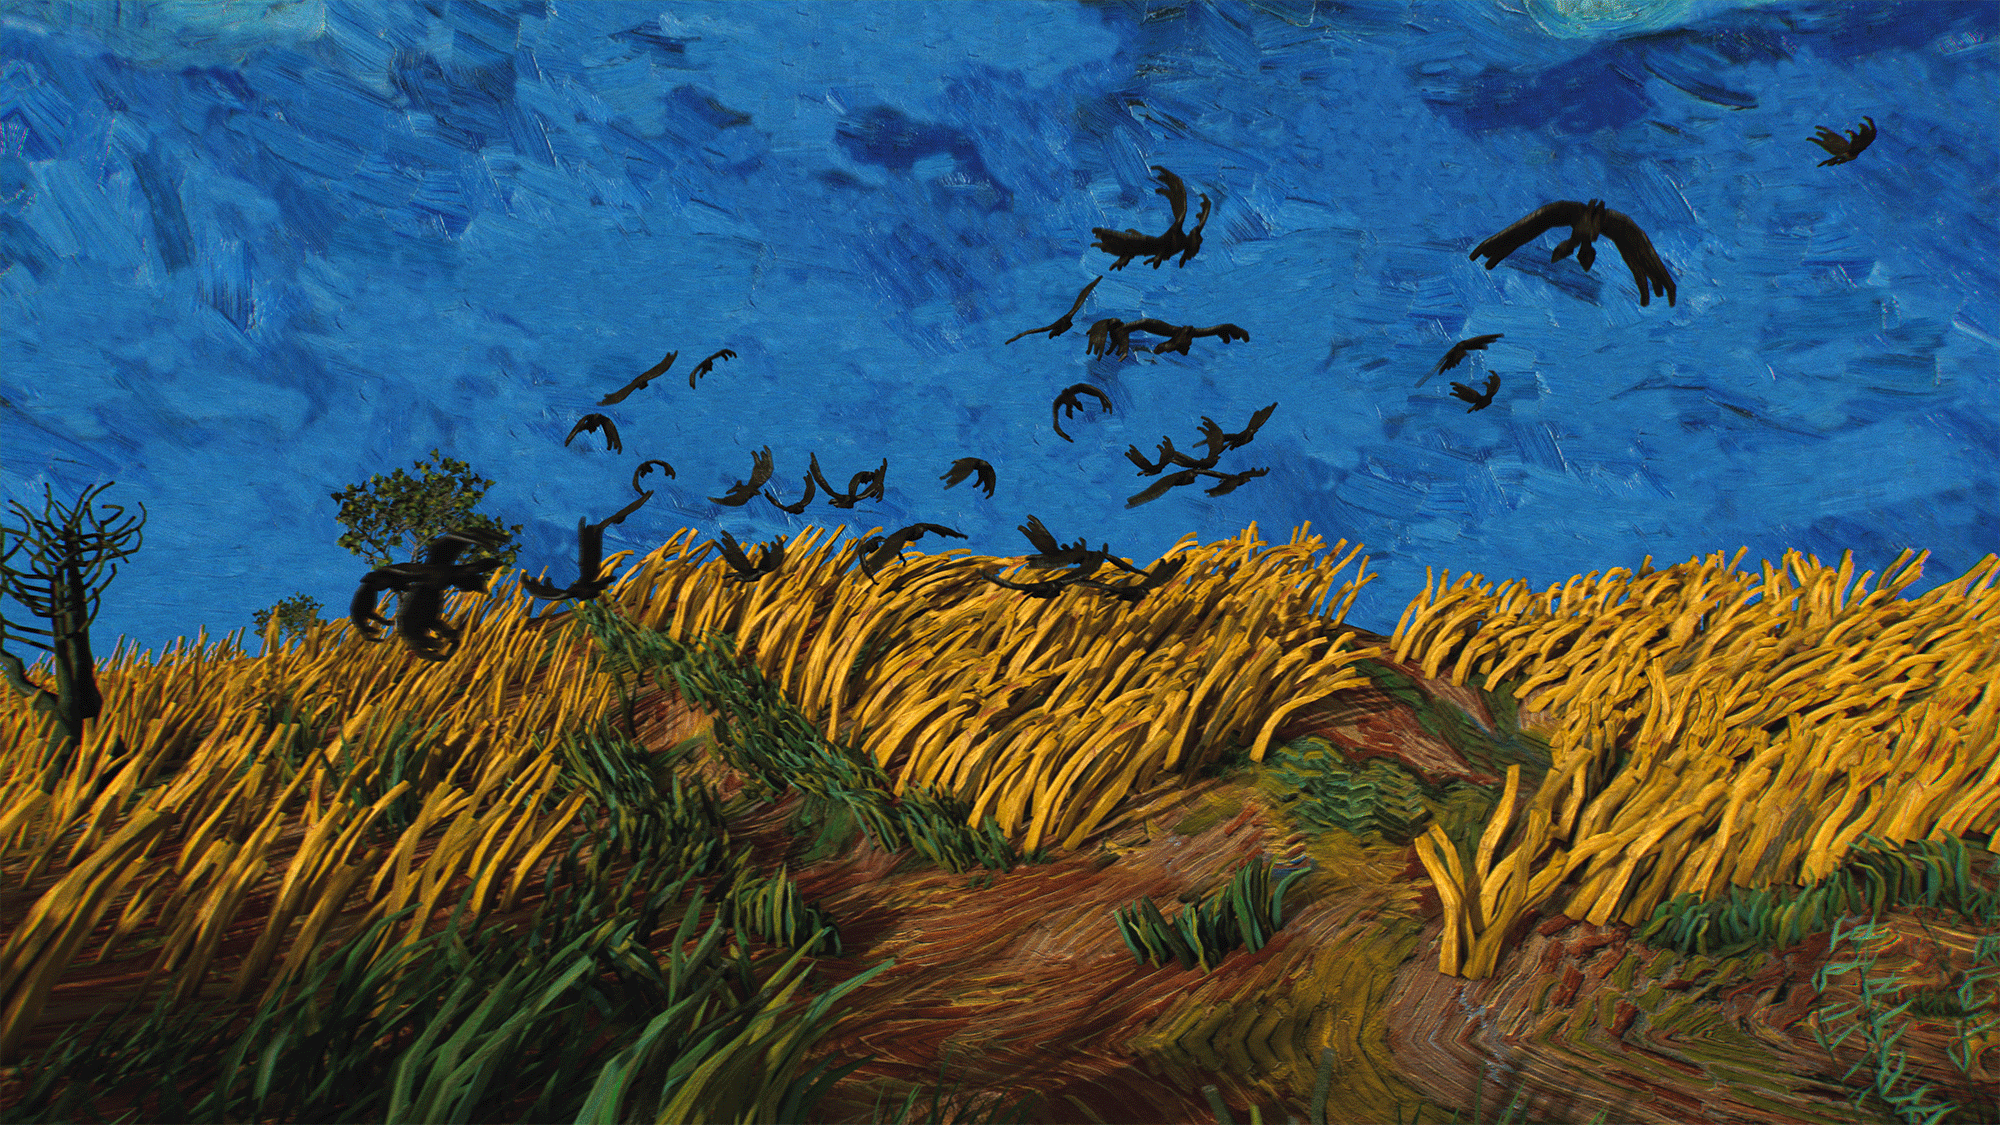 Van_Gogh_Maciek_Janicki_Still__0003_Layer-22.png